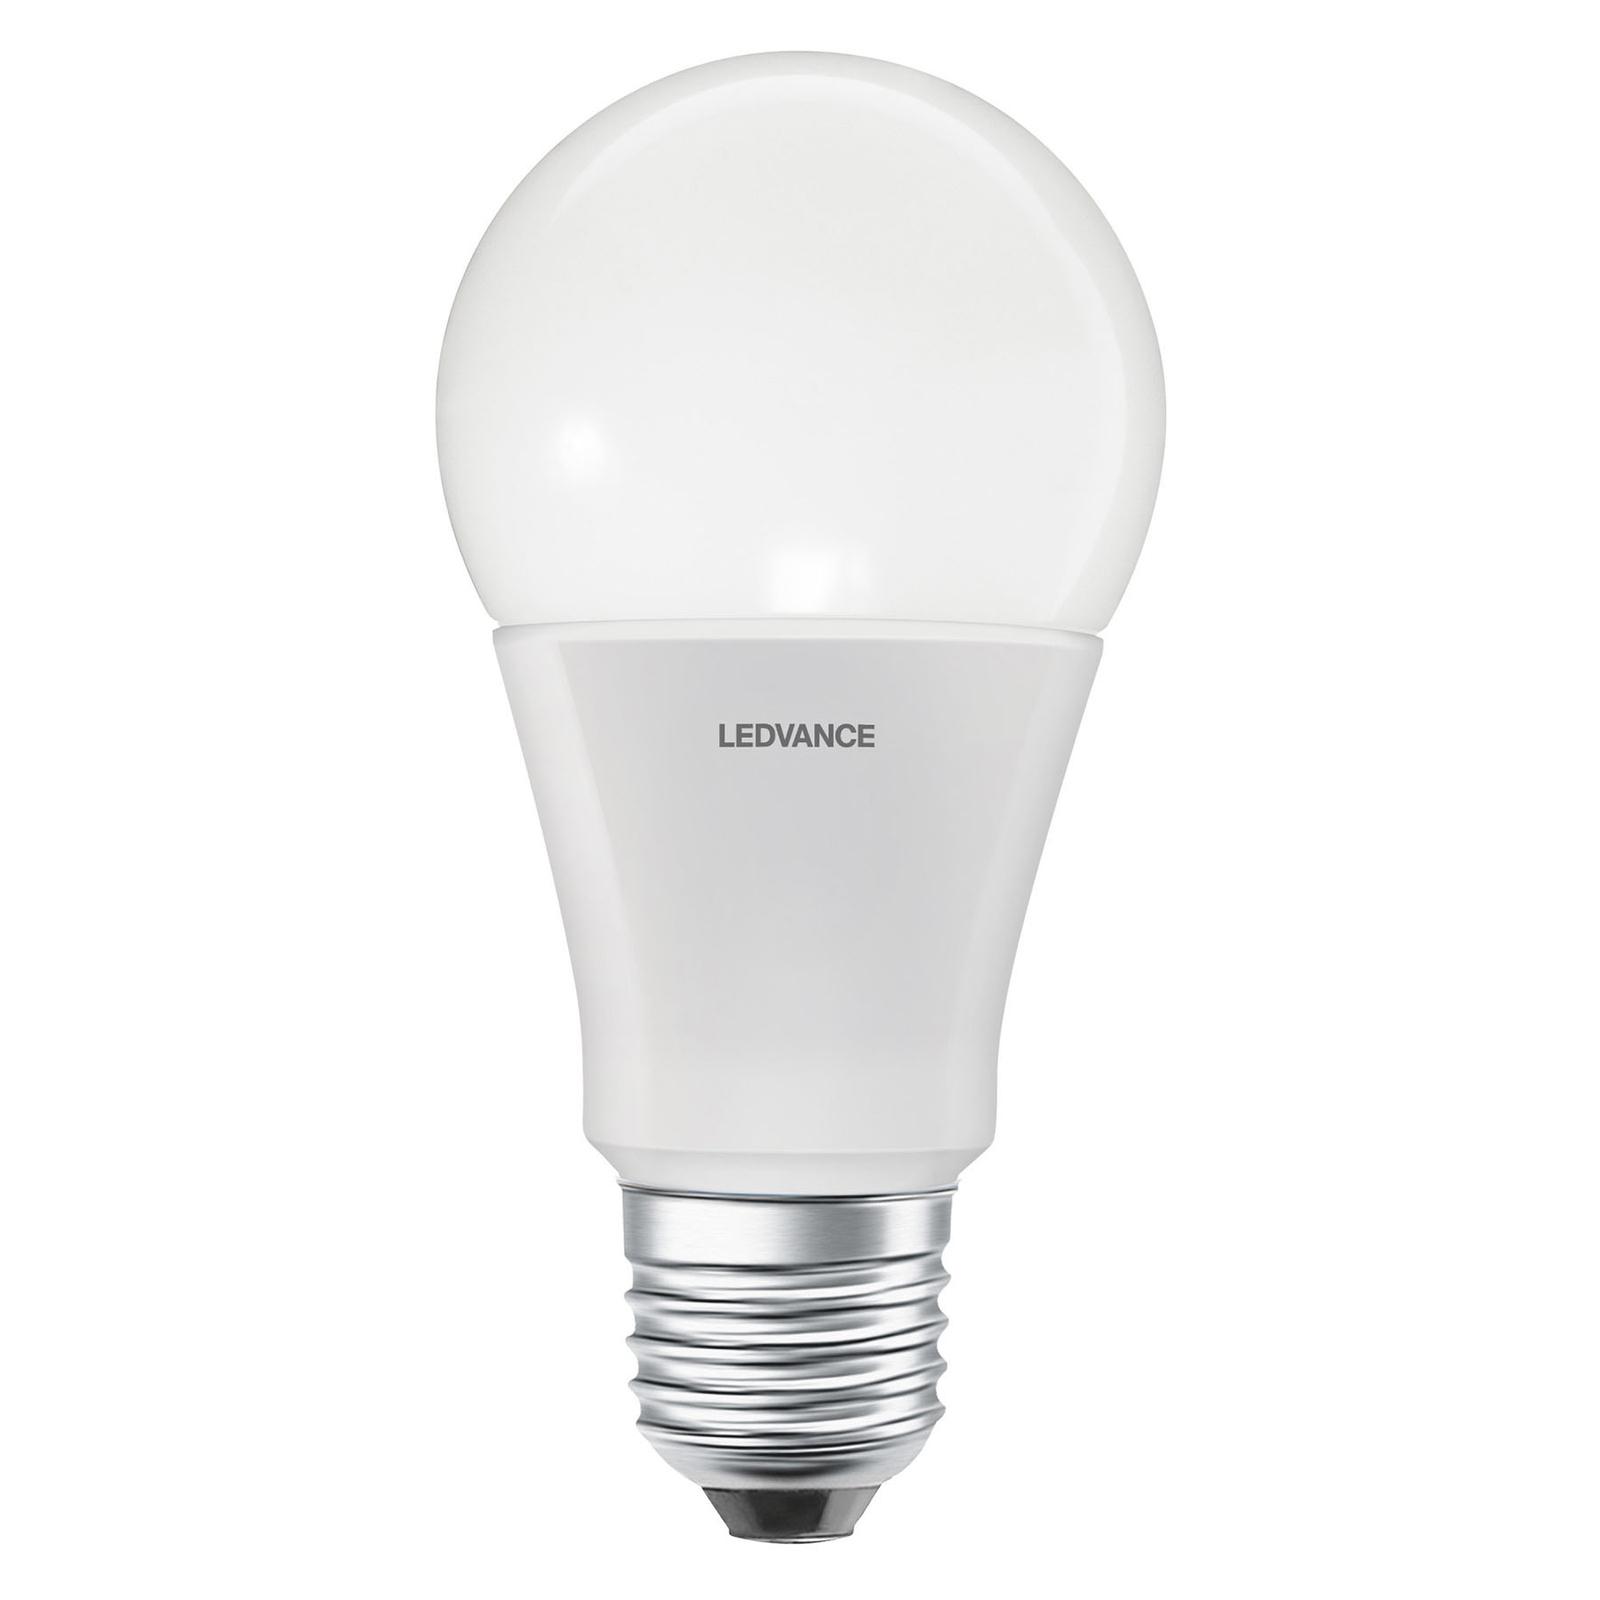 LEDVANCE SMART+ WiFi E27 9W Classic 2700K